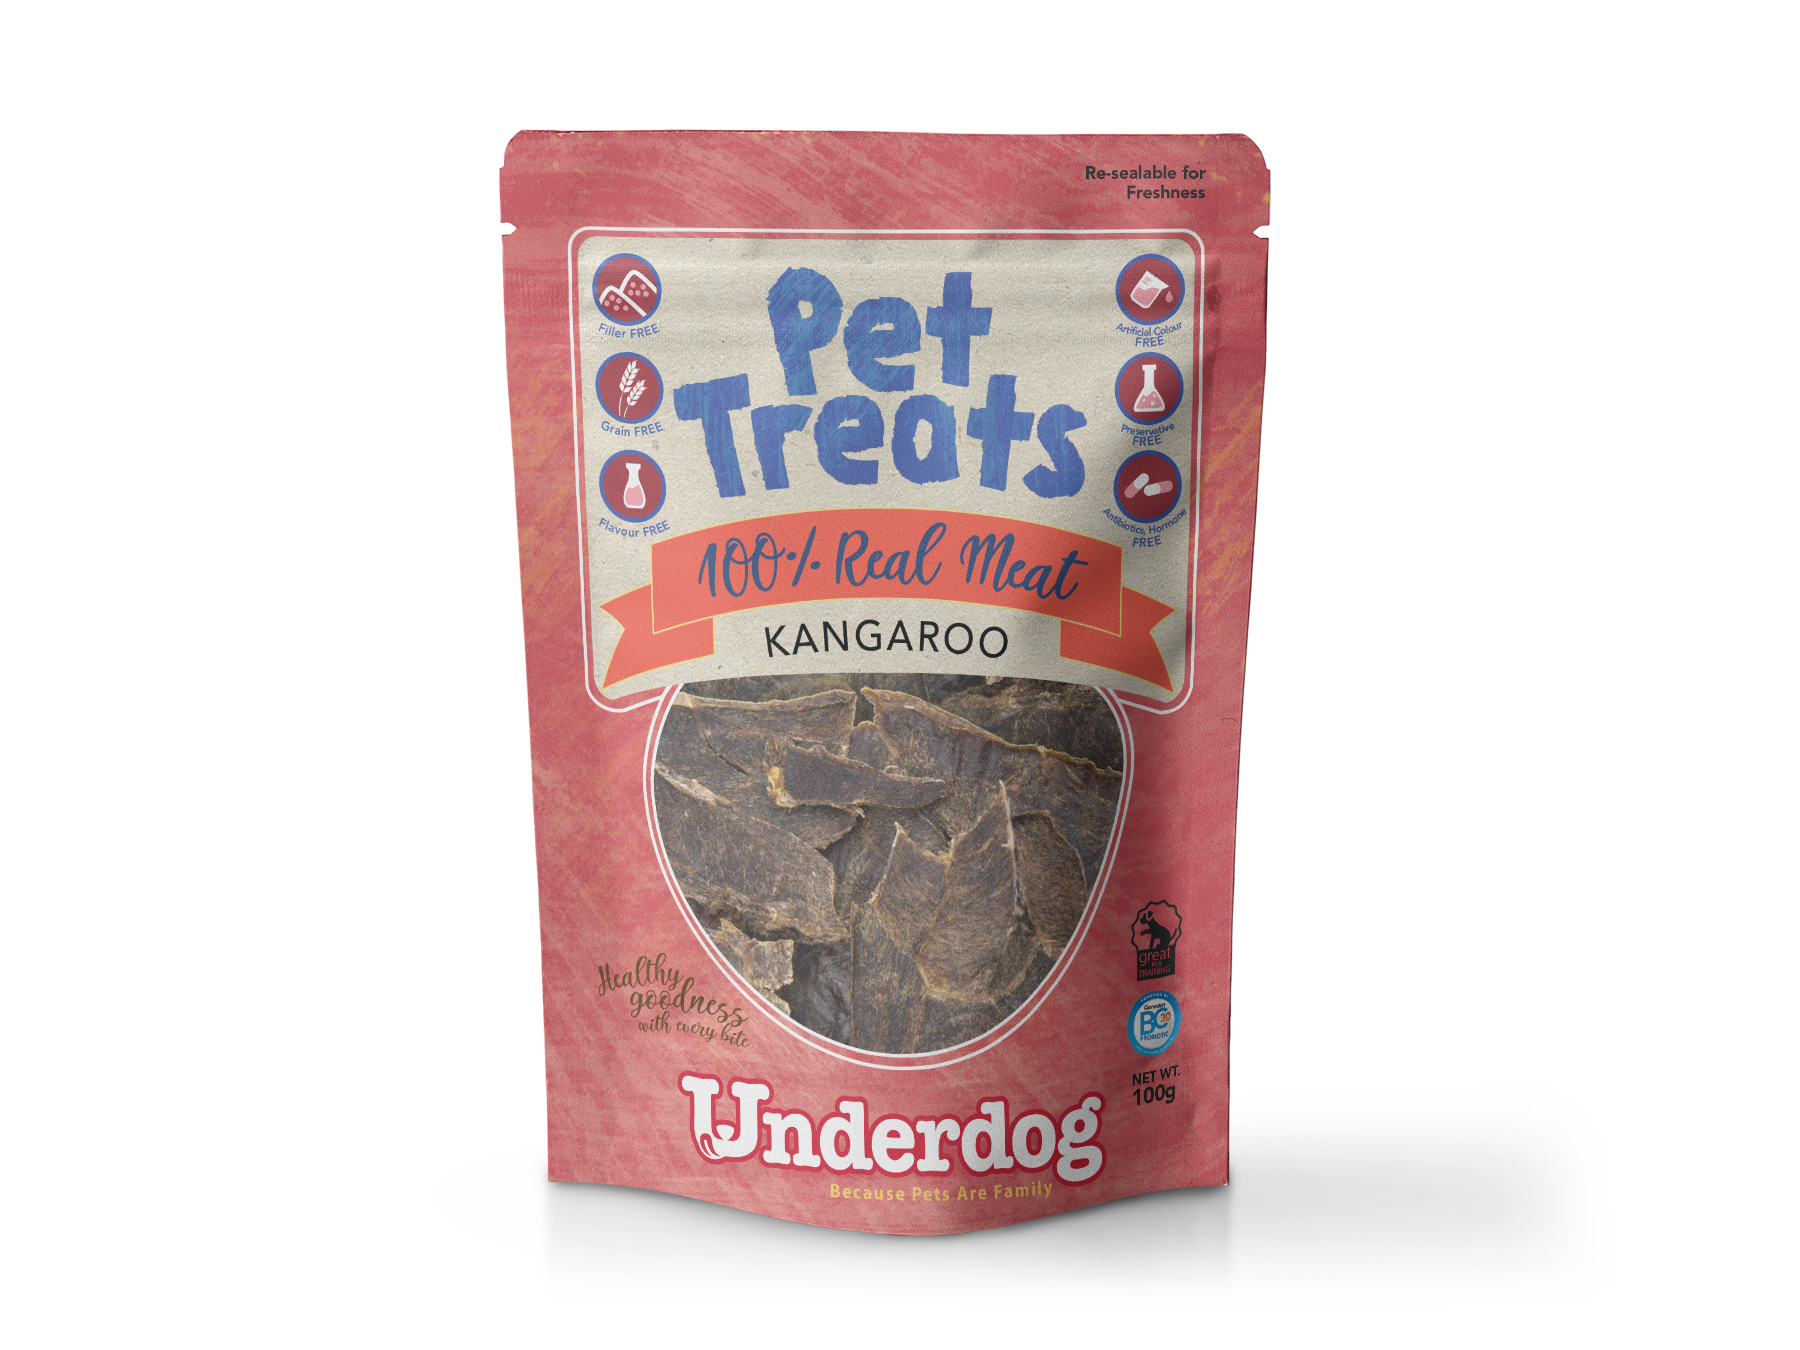 underdog-pet-foods-singapore.jpg